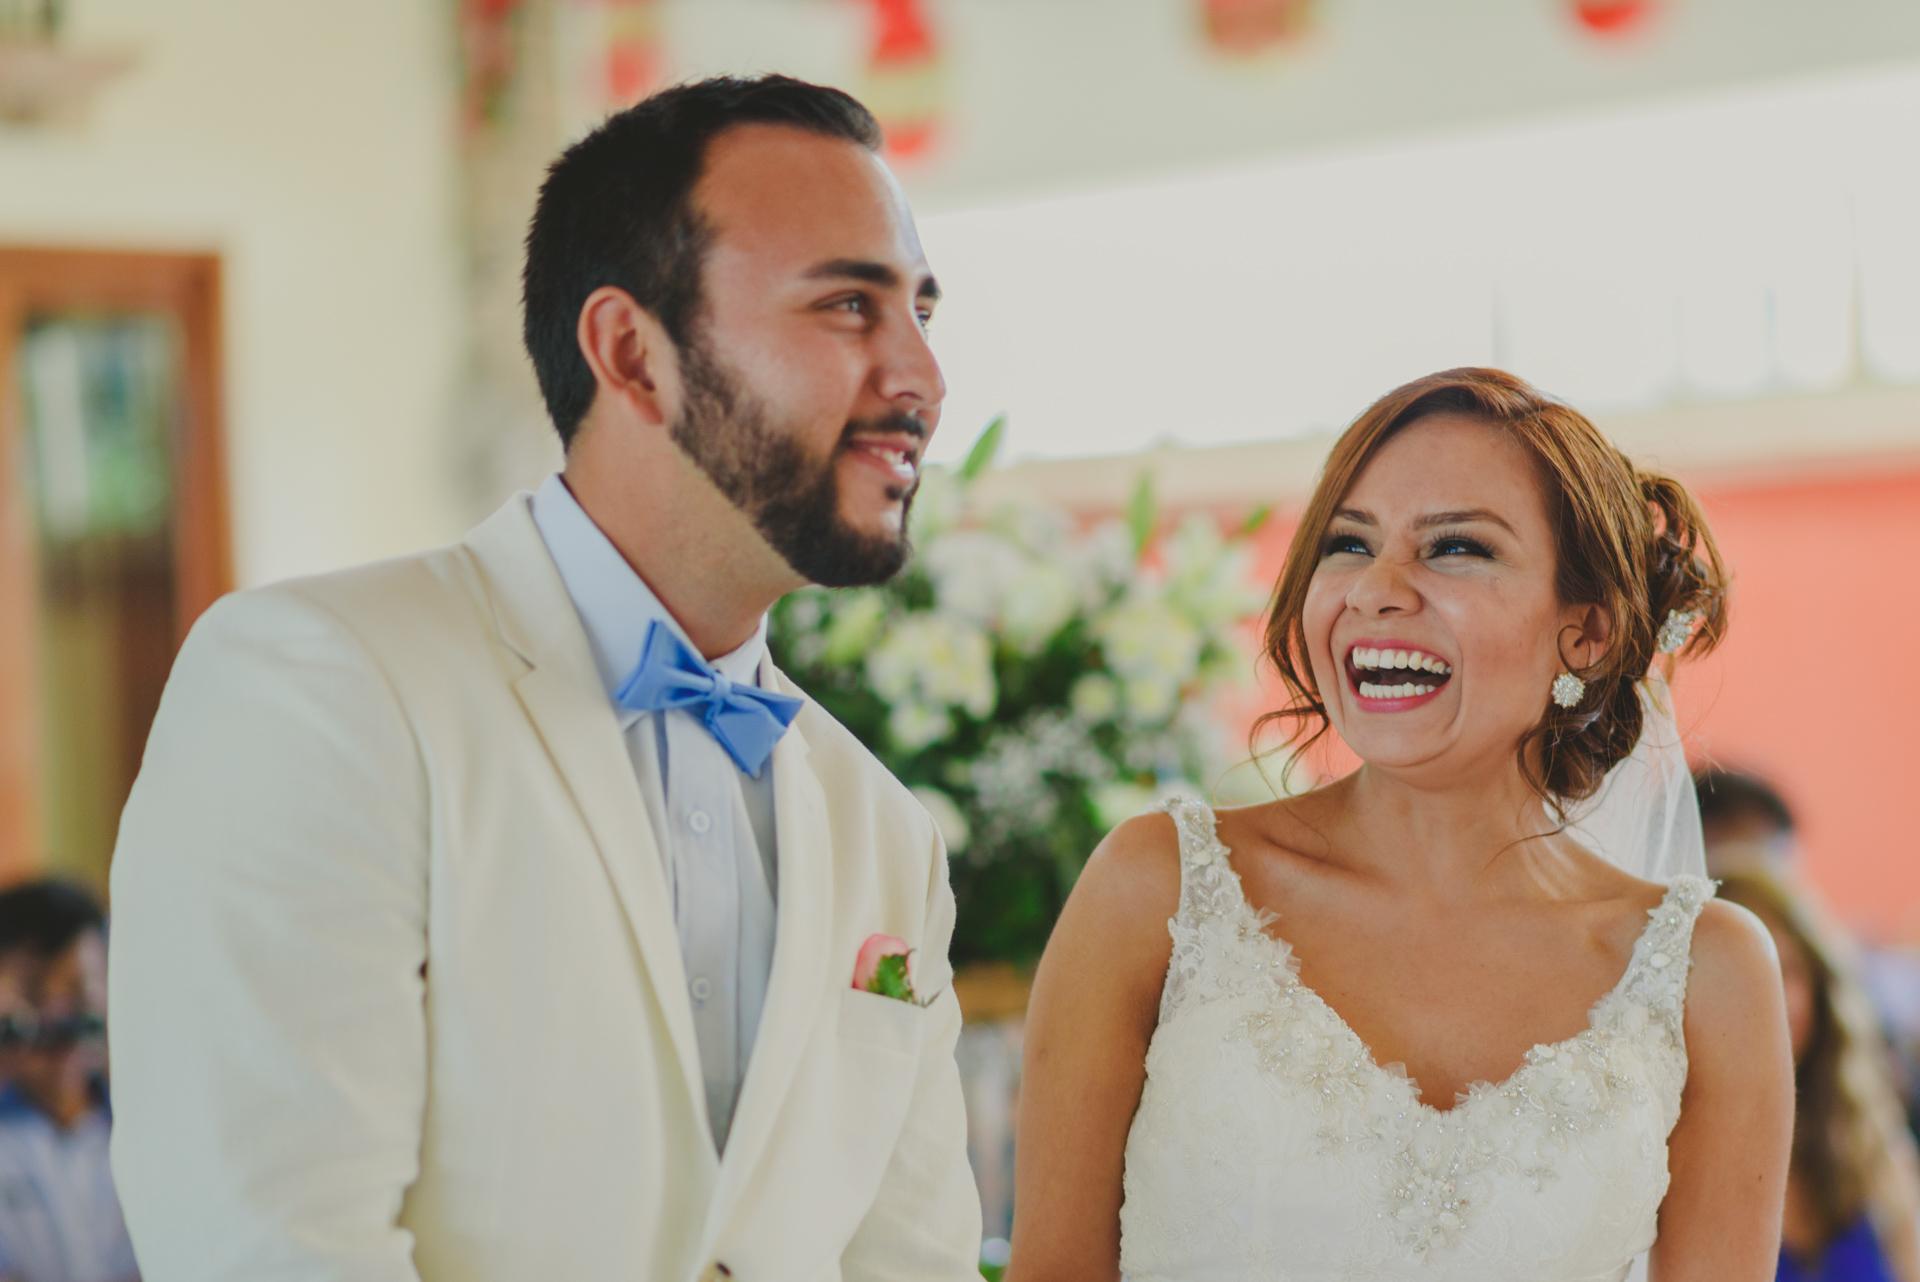 Wedding N&M BLOG luishoudin.com (52 de 174)